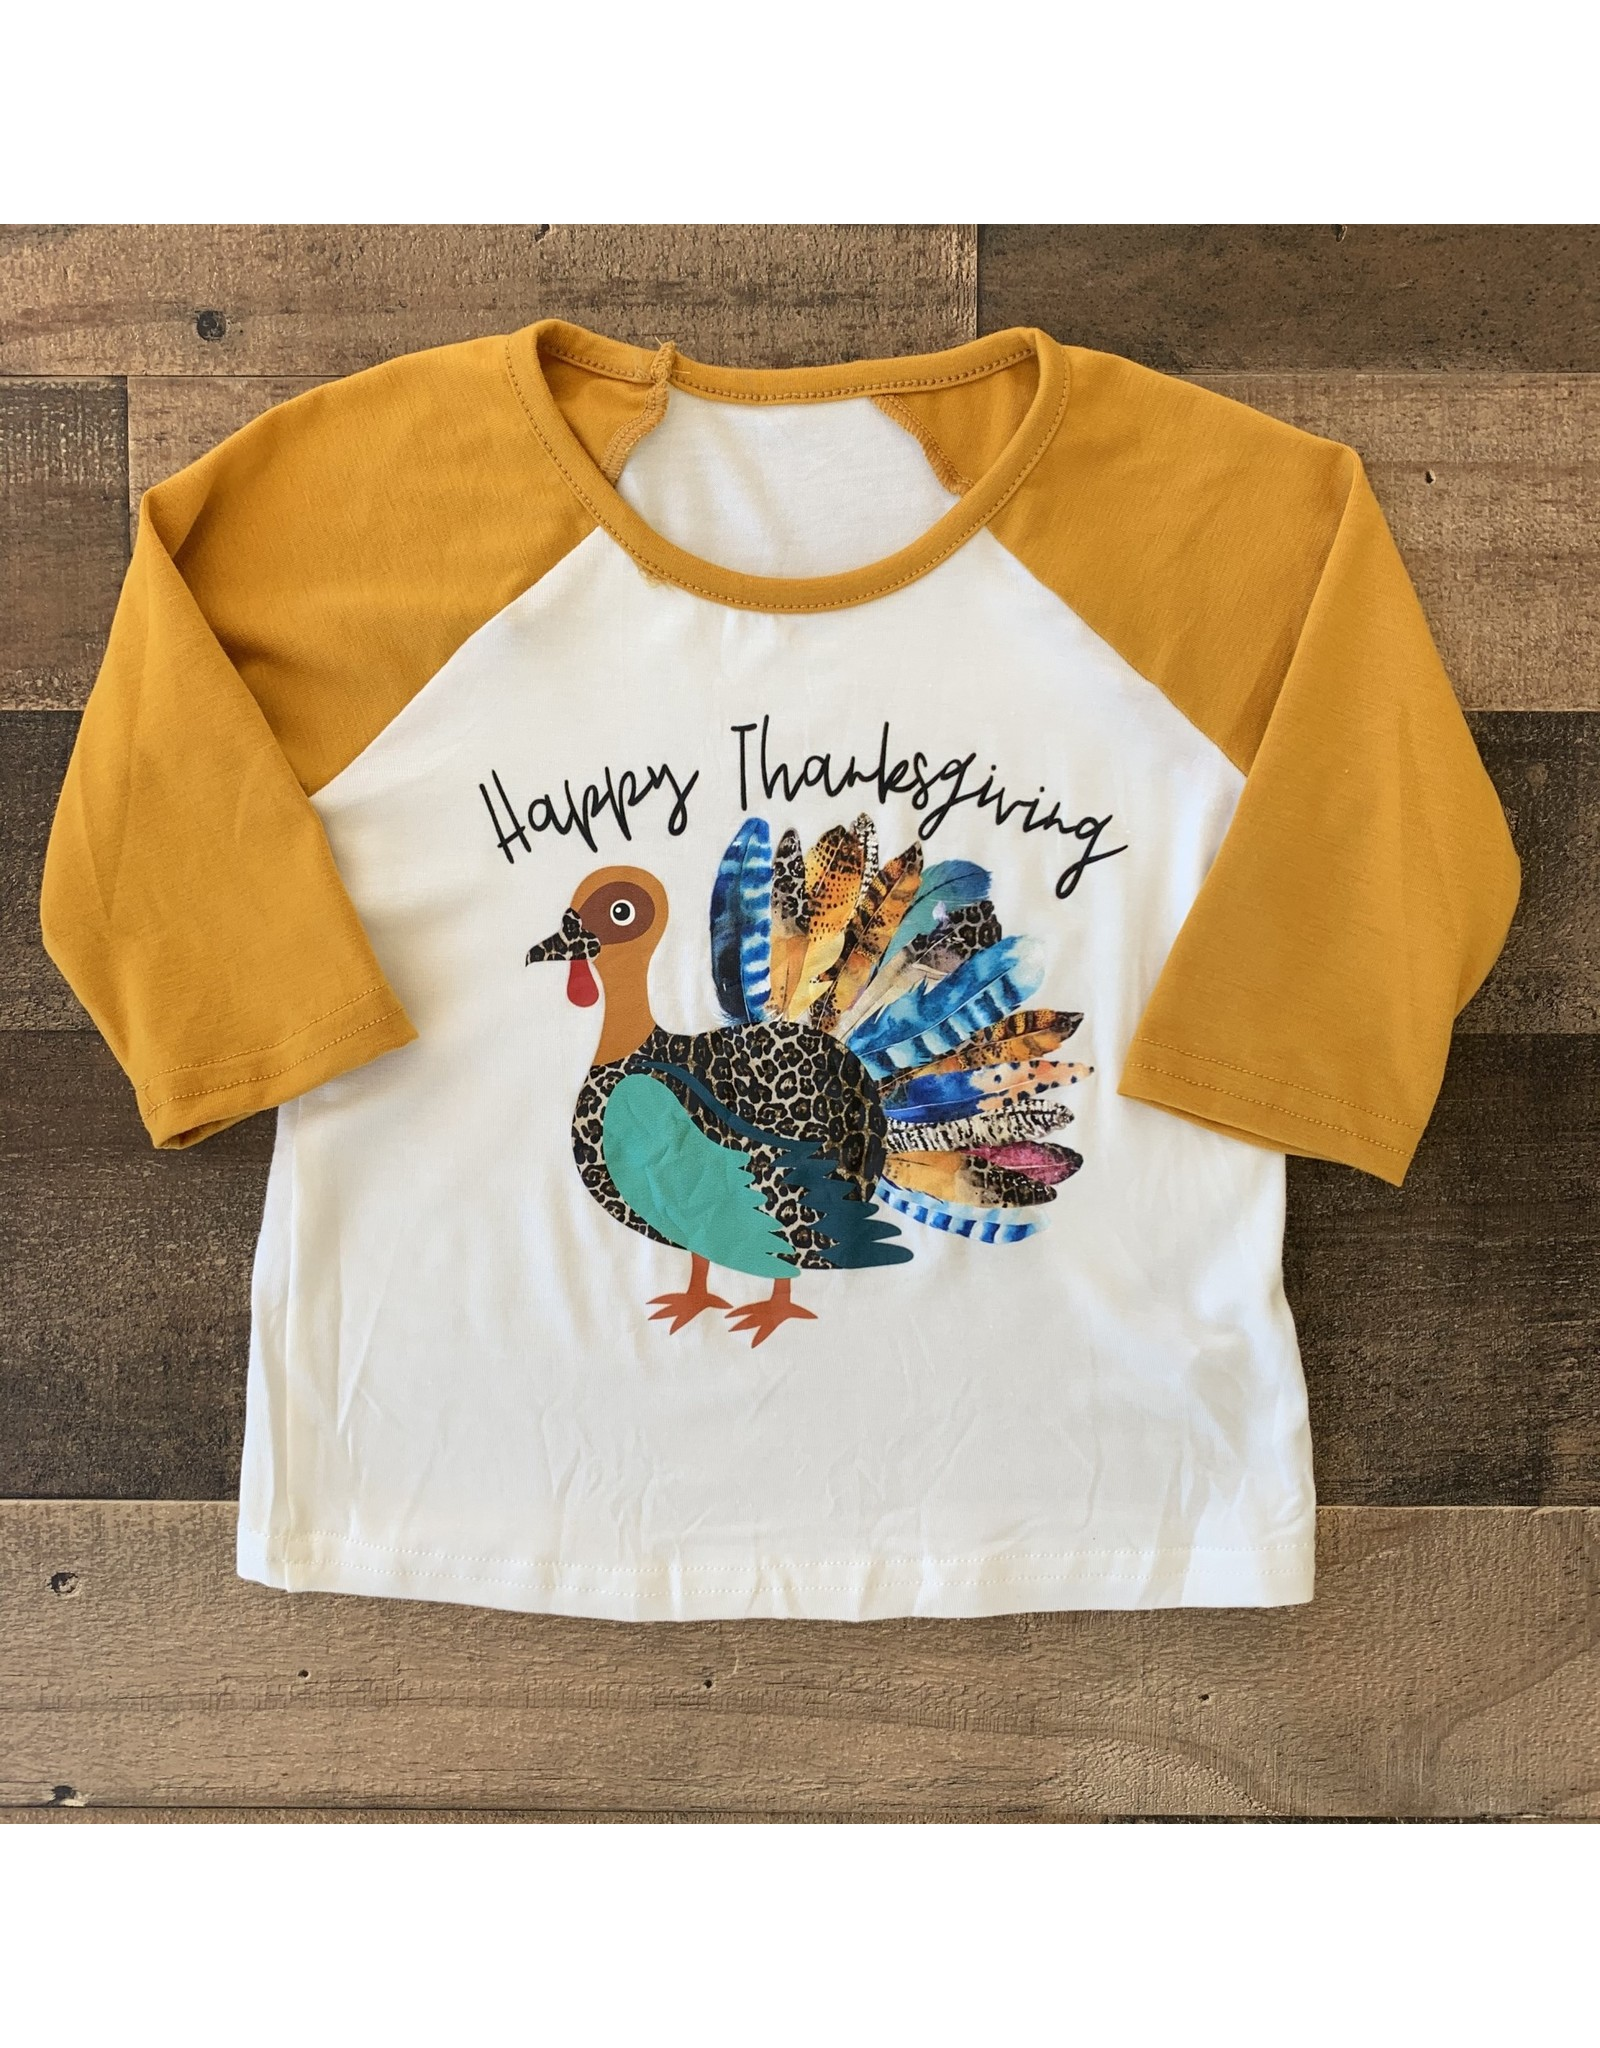 Happy Thanksgiving Mustard Sleeve Turkey Shirt